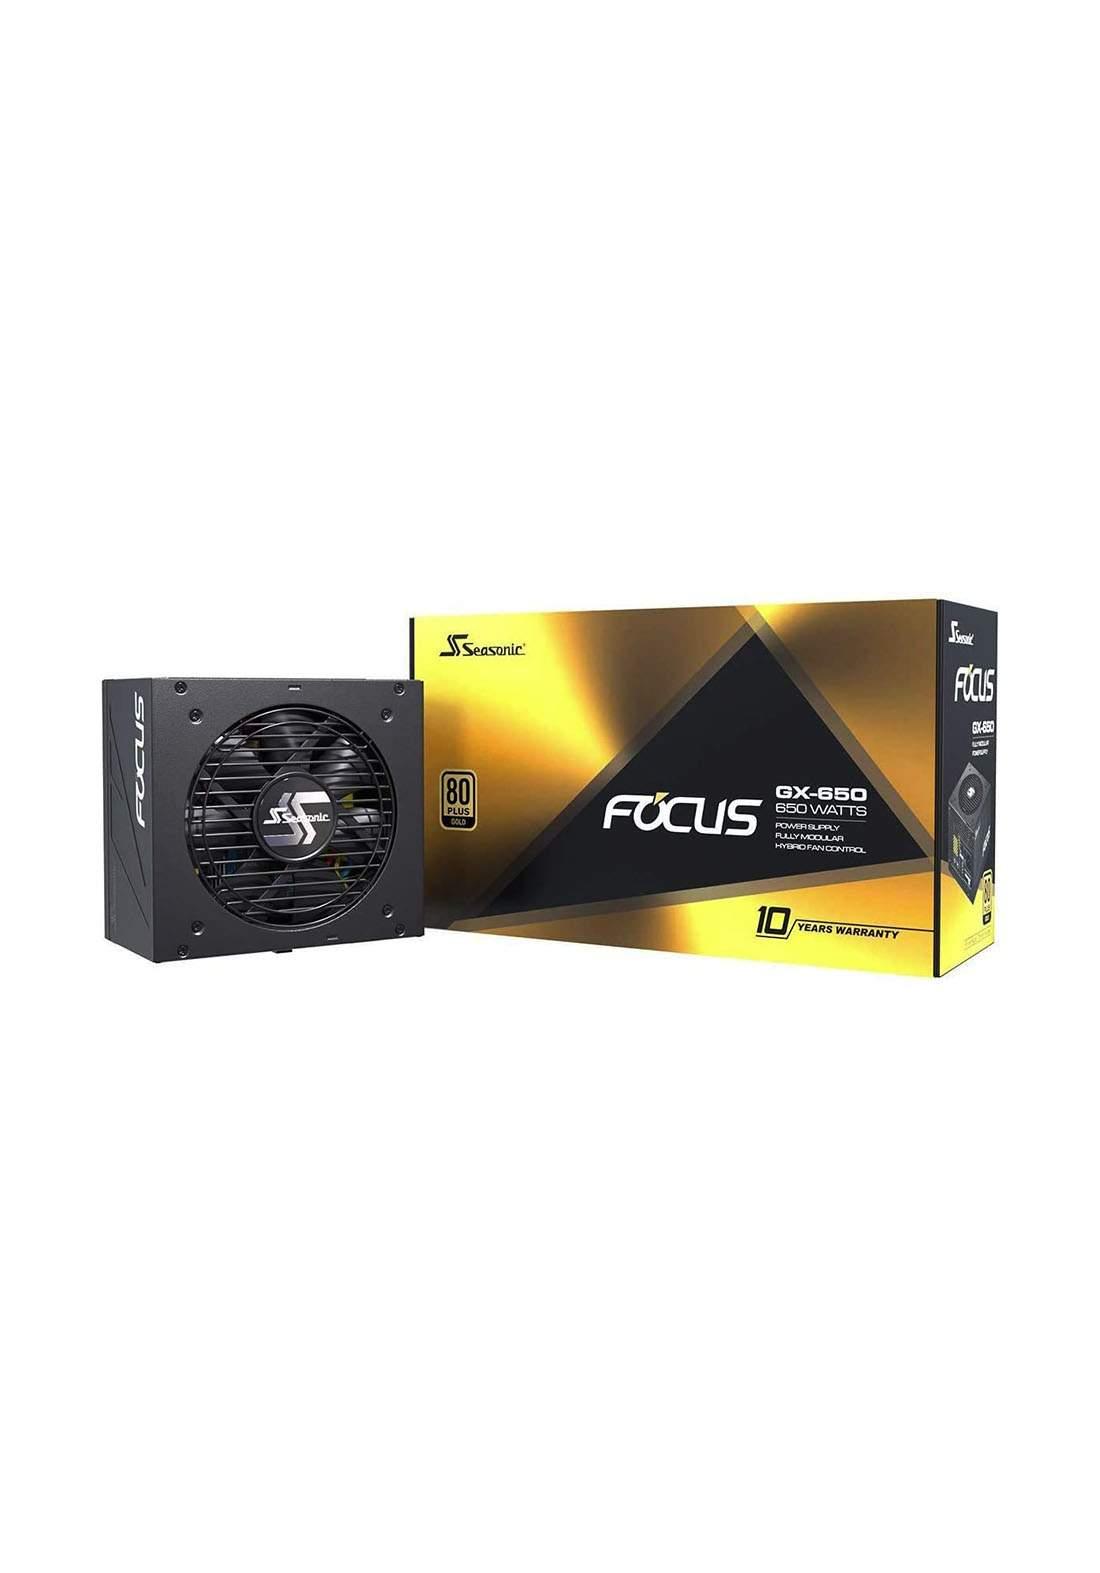 Seasonic Focus GX-650 650W 80 Gold Power Supply- Black مجهز طاقة